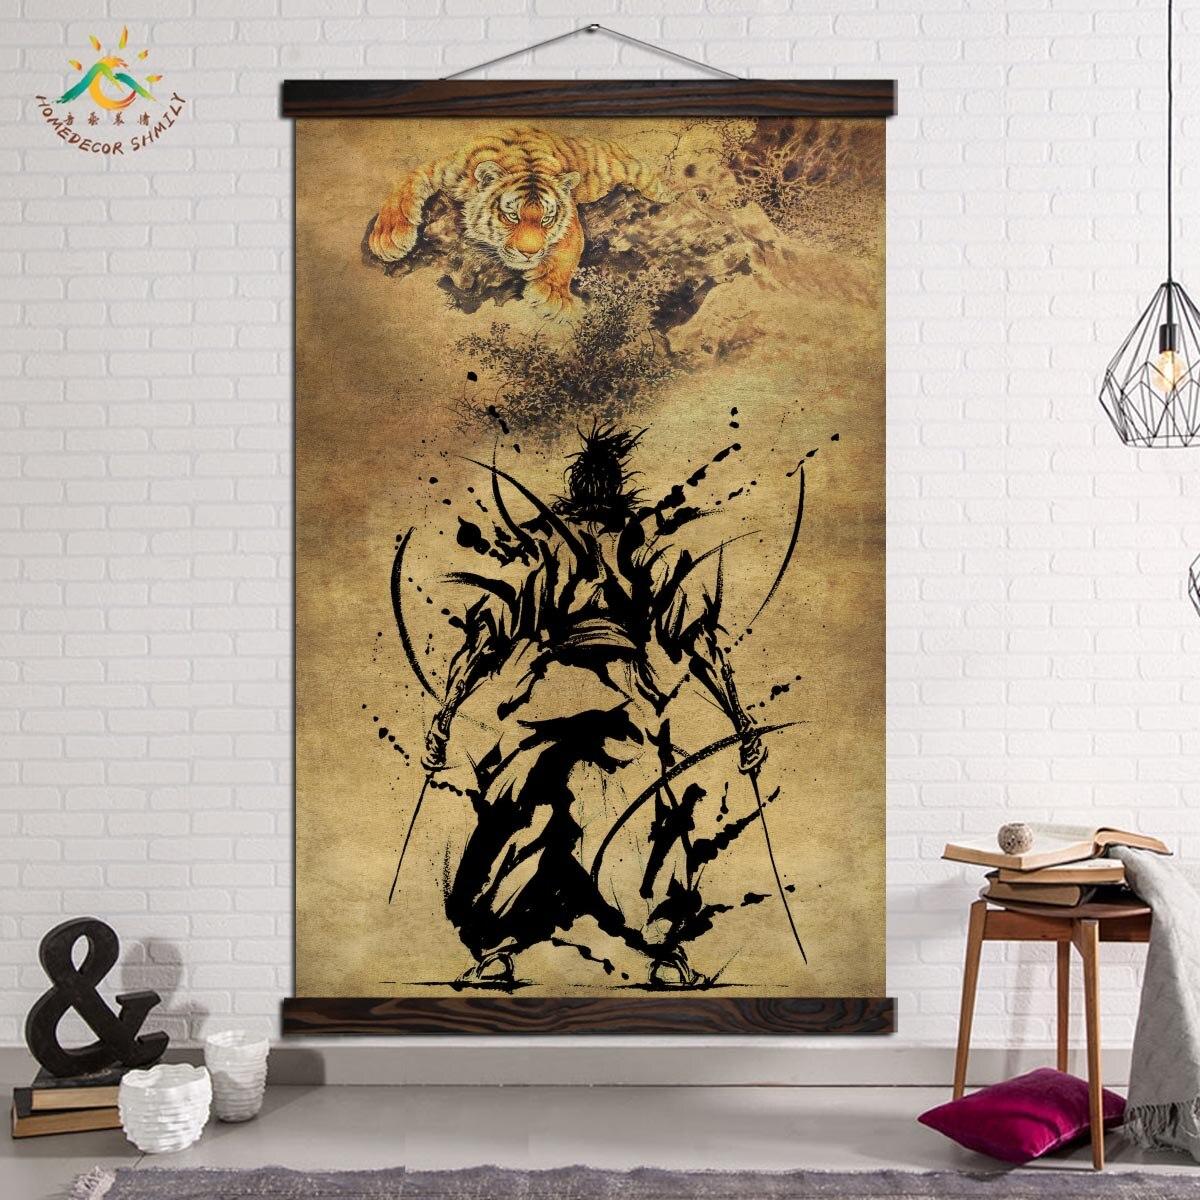 Japanese Swordsman Ancient Tiger Posters And Prints Wall Art